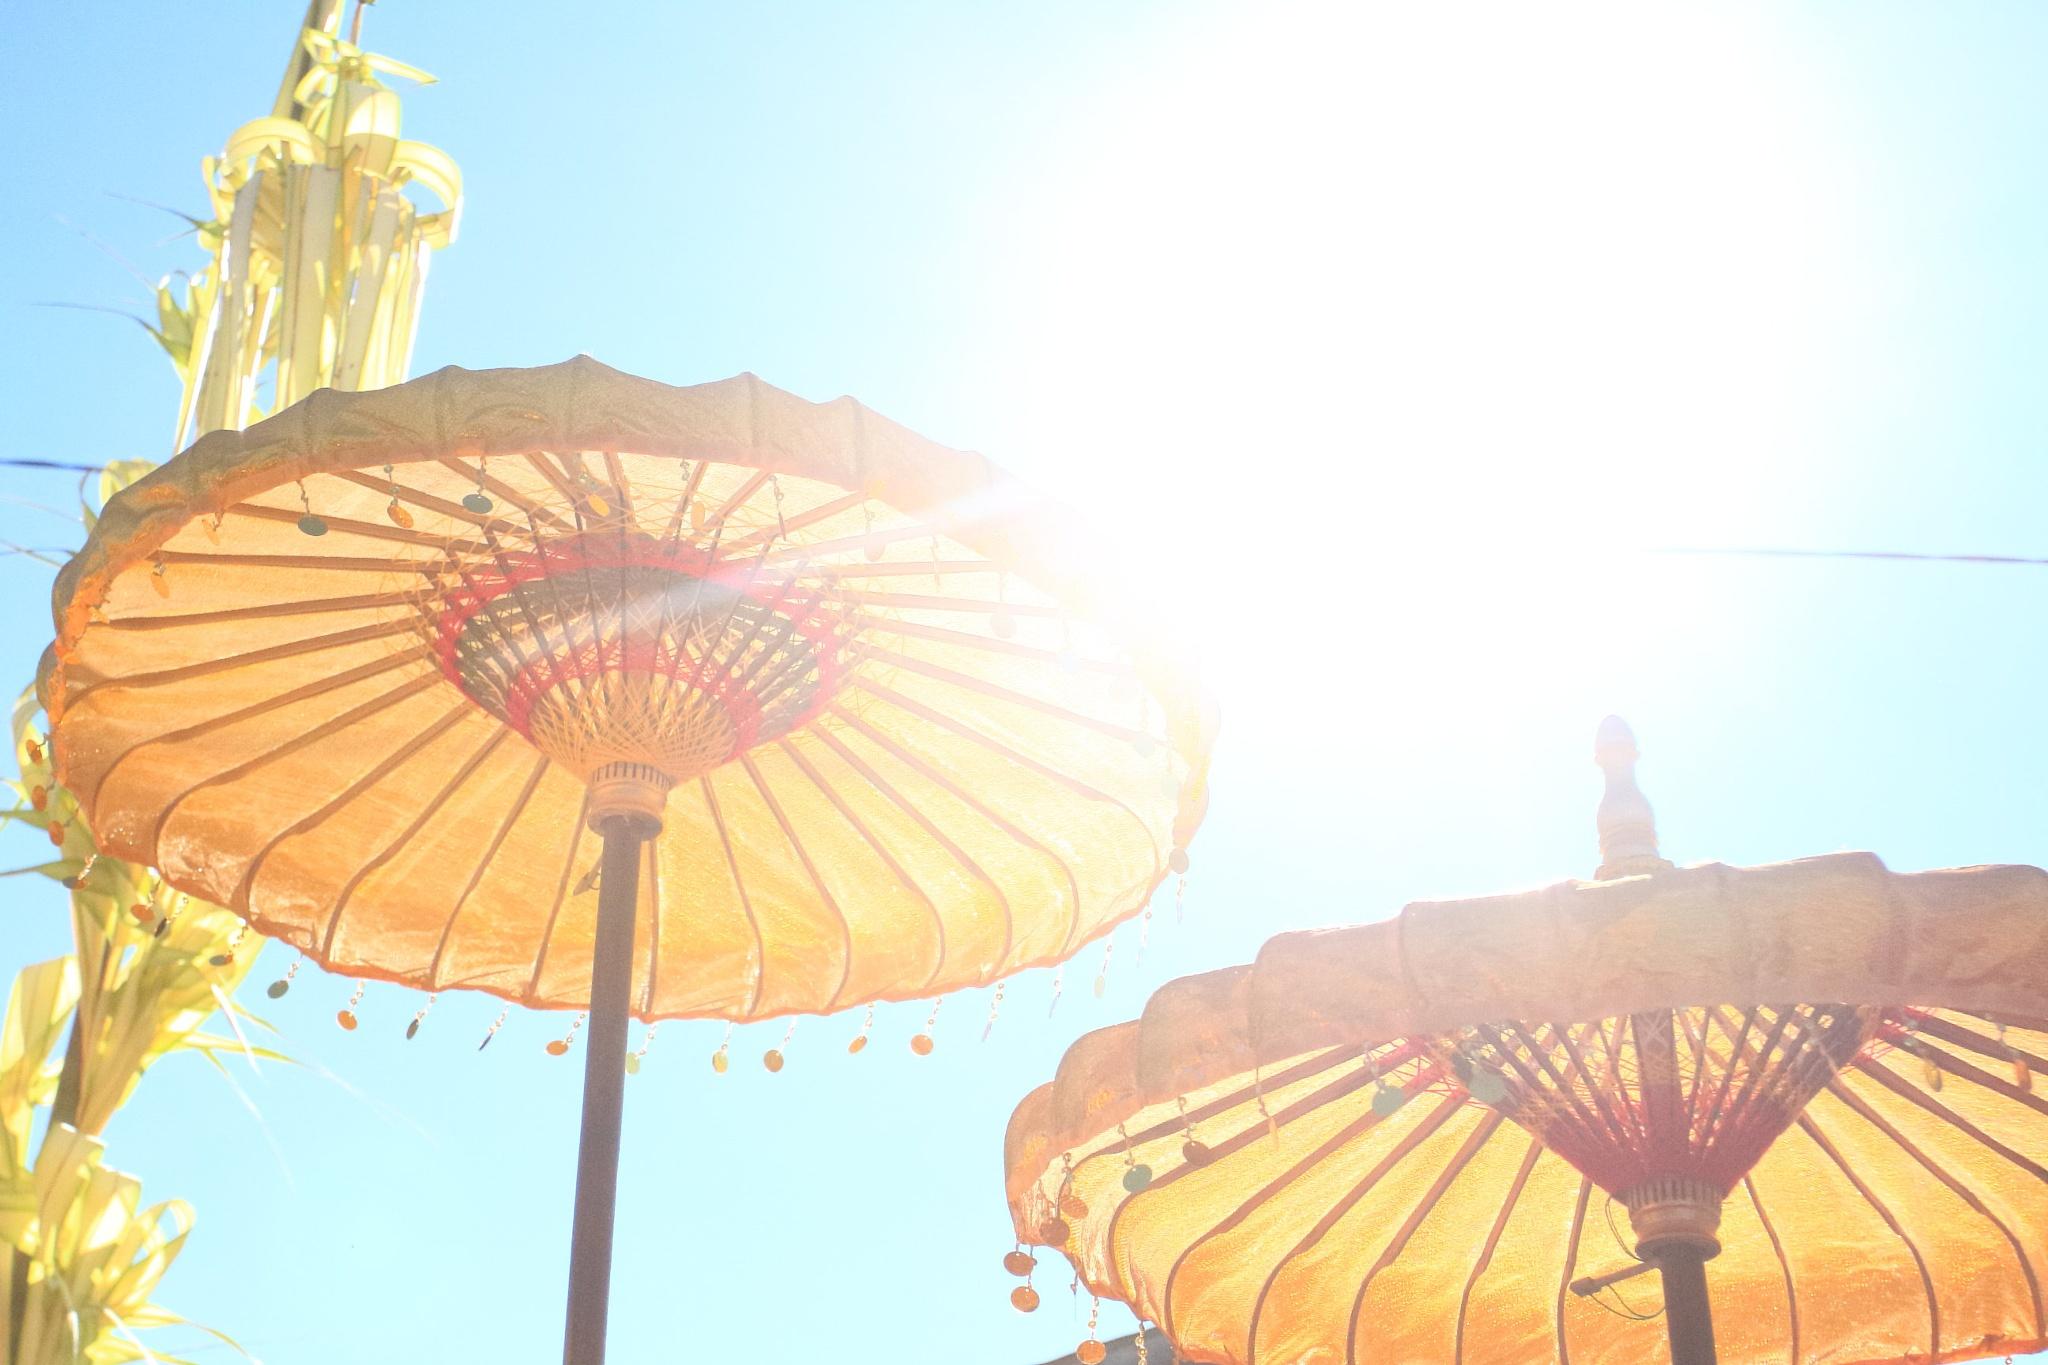 the umbrella by Garuda Dewa Ardra